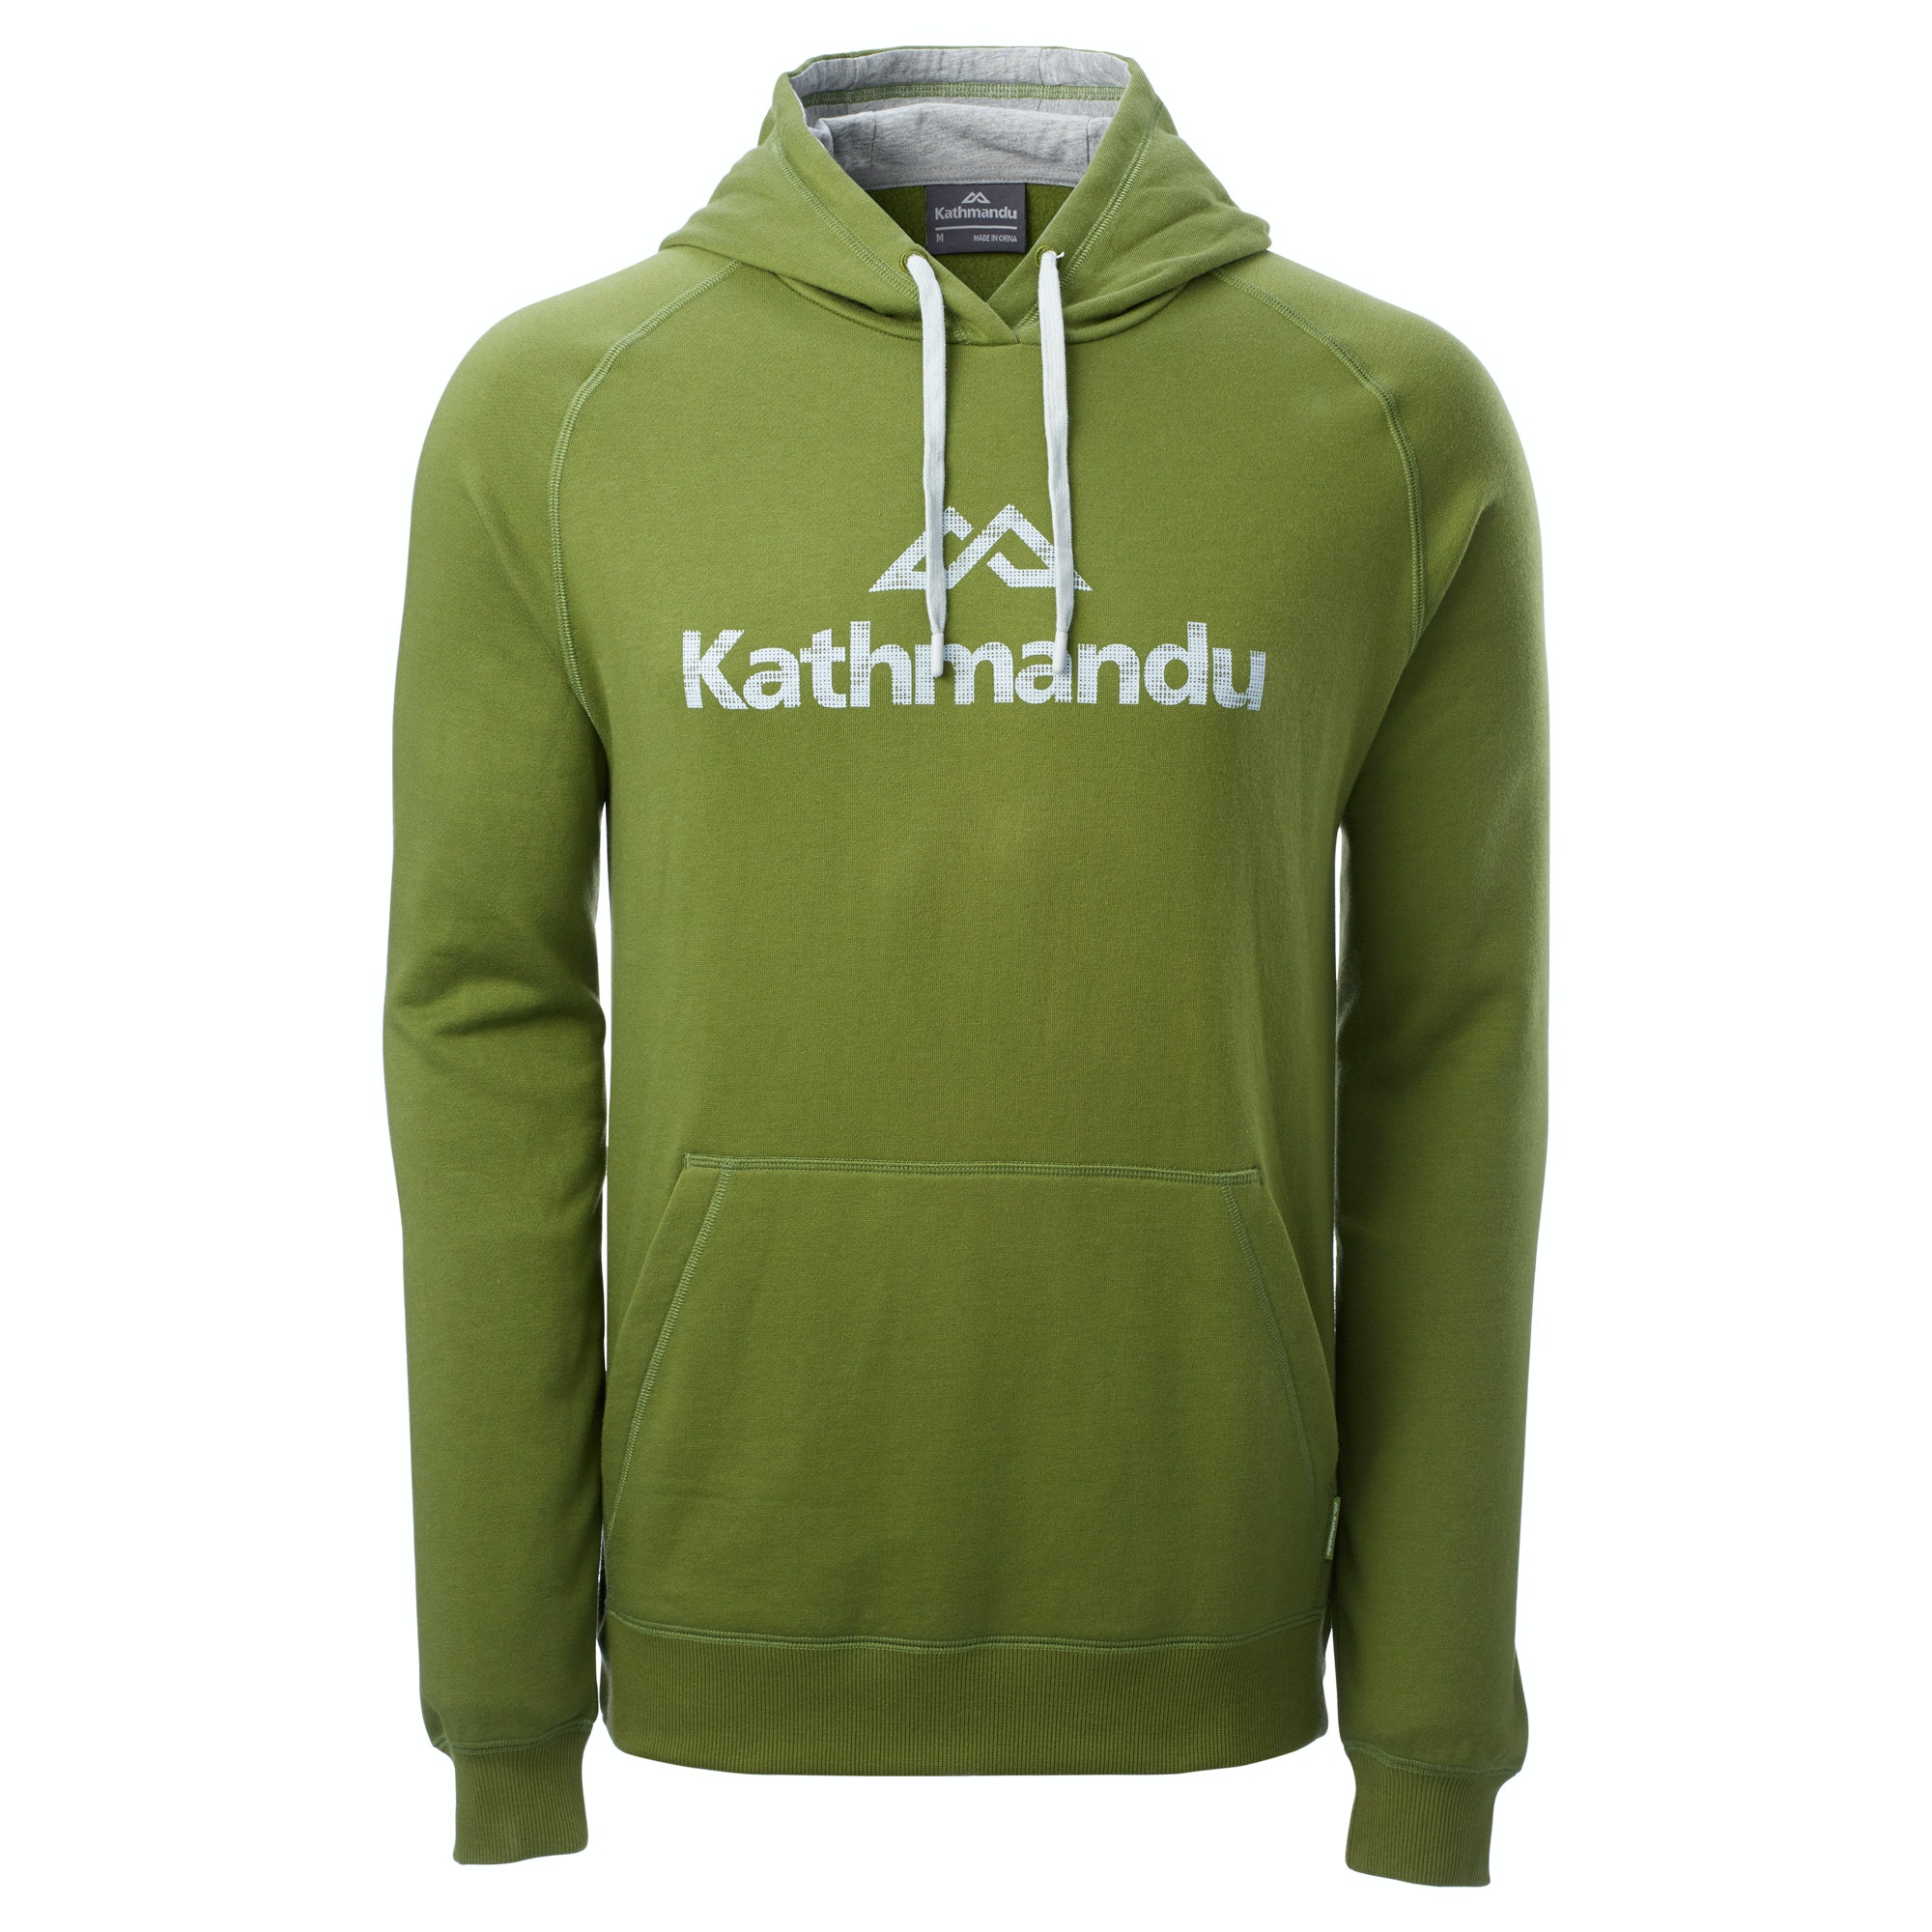 kathmandu mens hooded pullover v2 dark navy chilli pepper. Black Bedroom Furniture Sets. Home Design Ideas